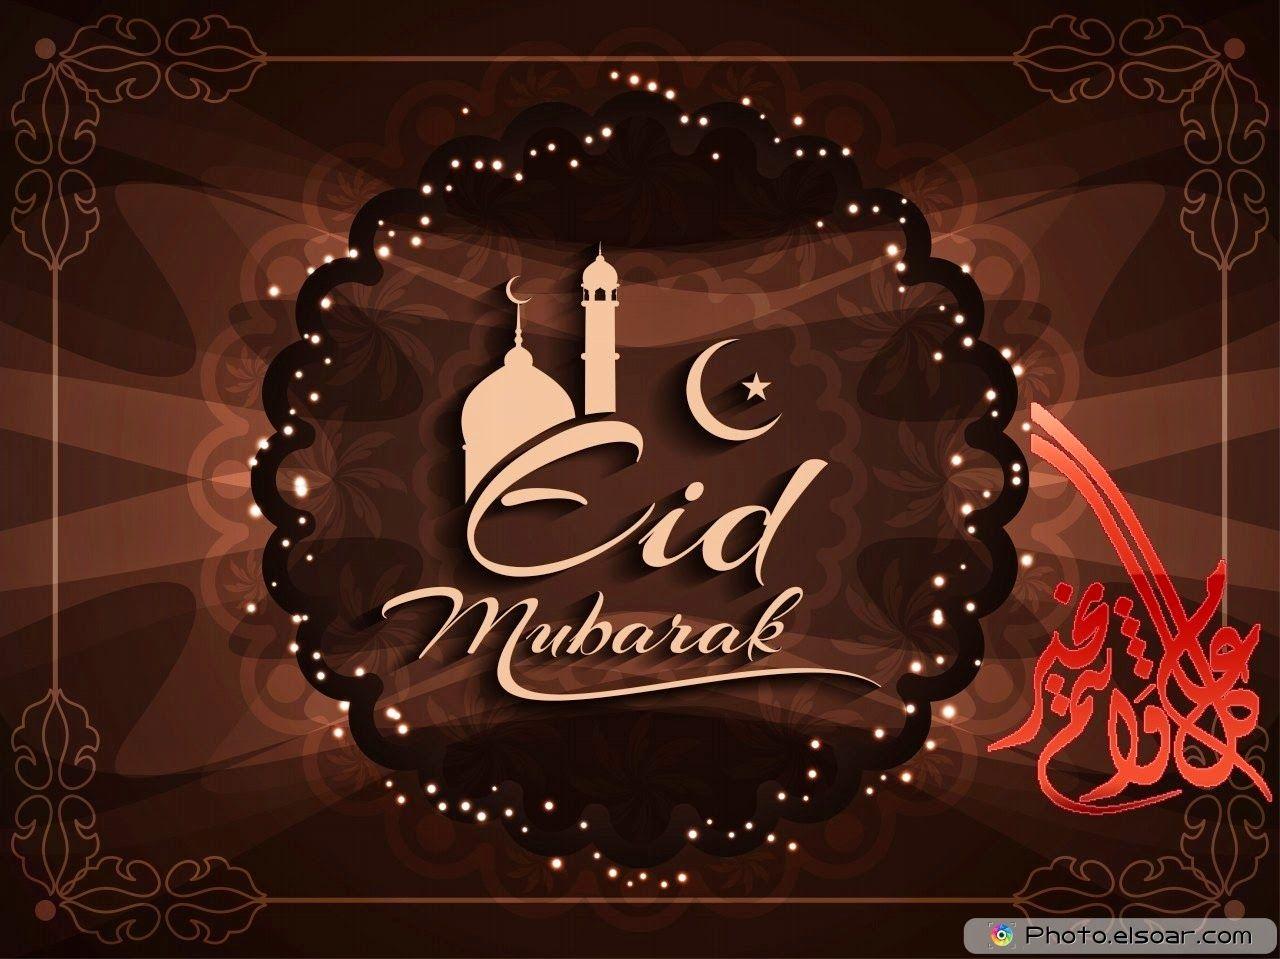 Wallpaper download eid - Eid Mubarak 2014 Wallpapers Eidmubarak Wallpapers